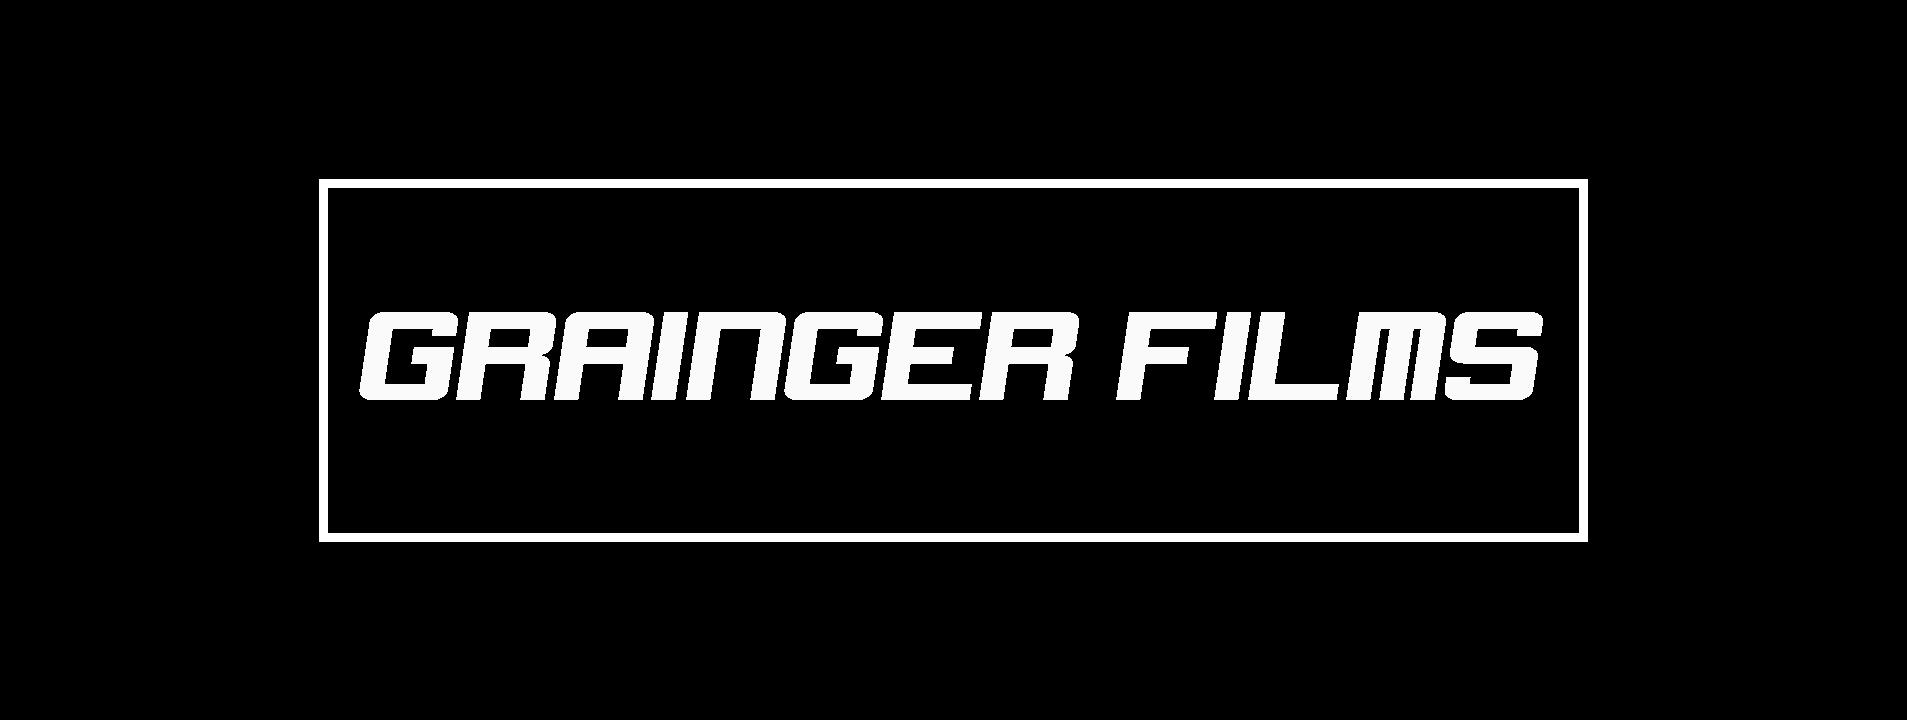 grainger-landing-page